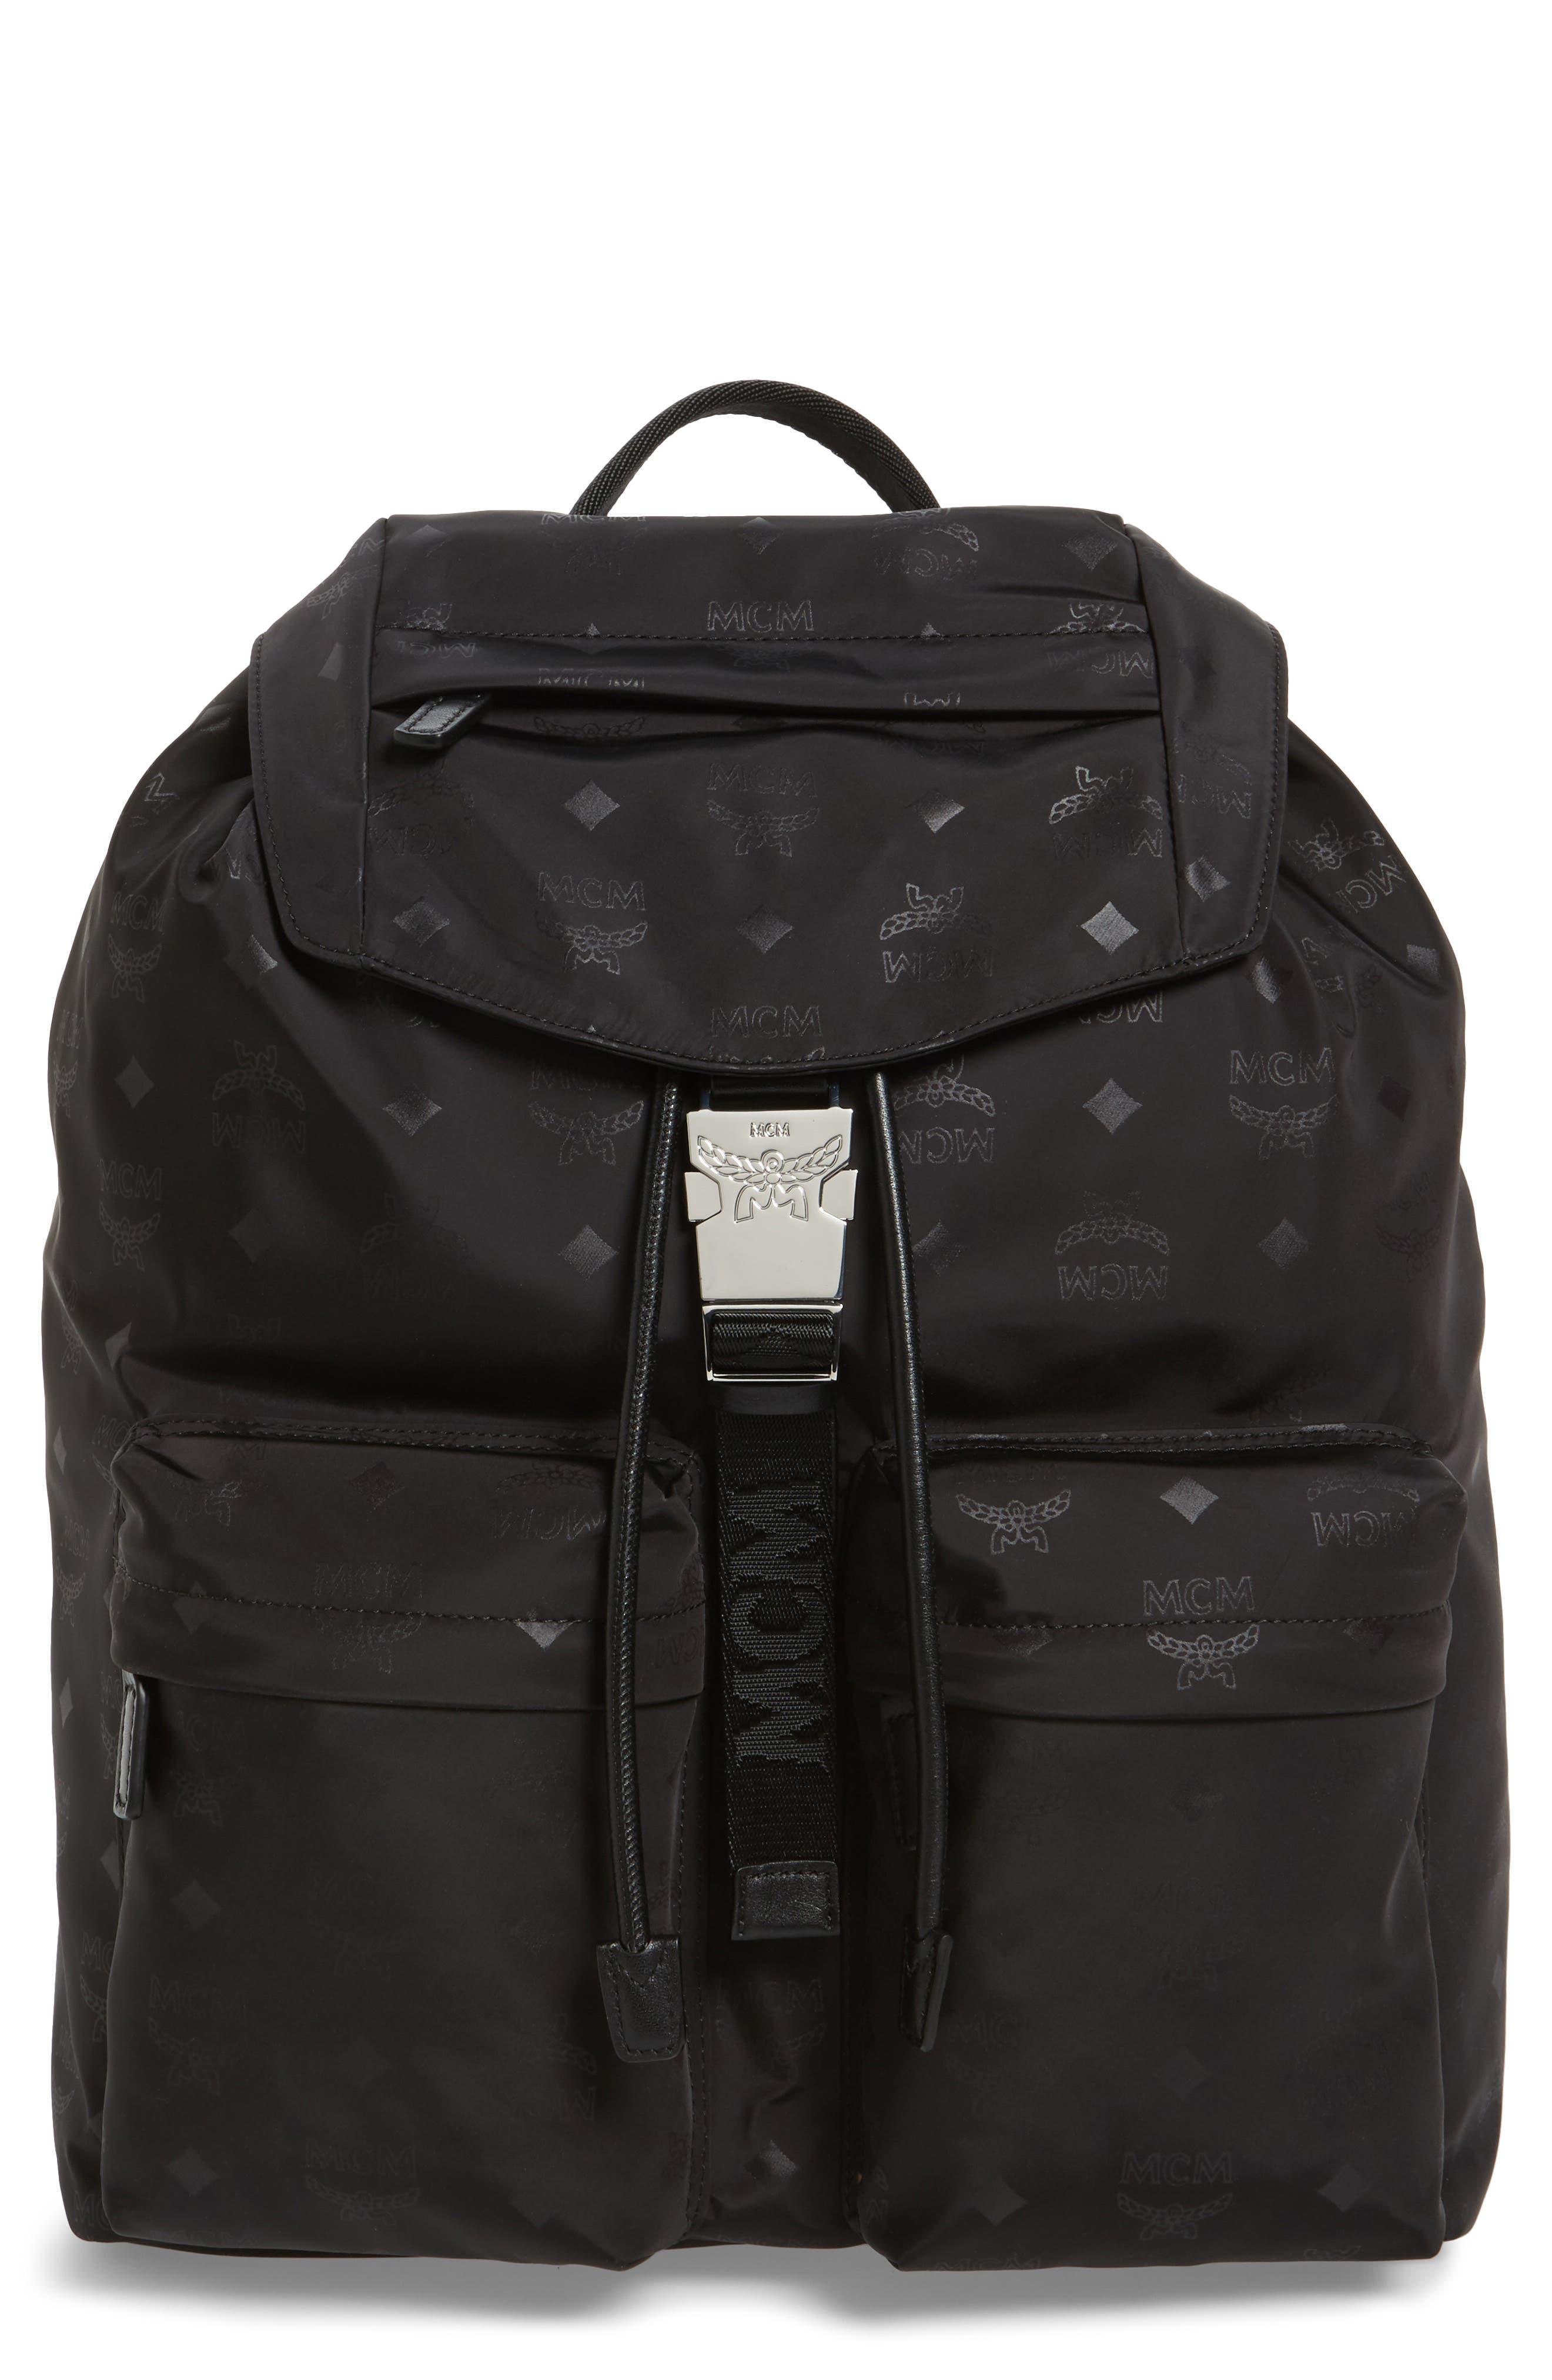 Alternate Image 1 Selected - MCM Large Dieter Monogrammed Nylon Backpack